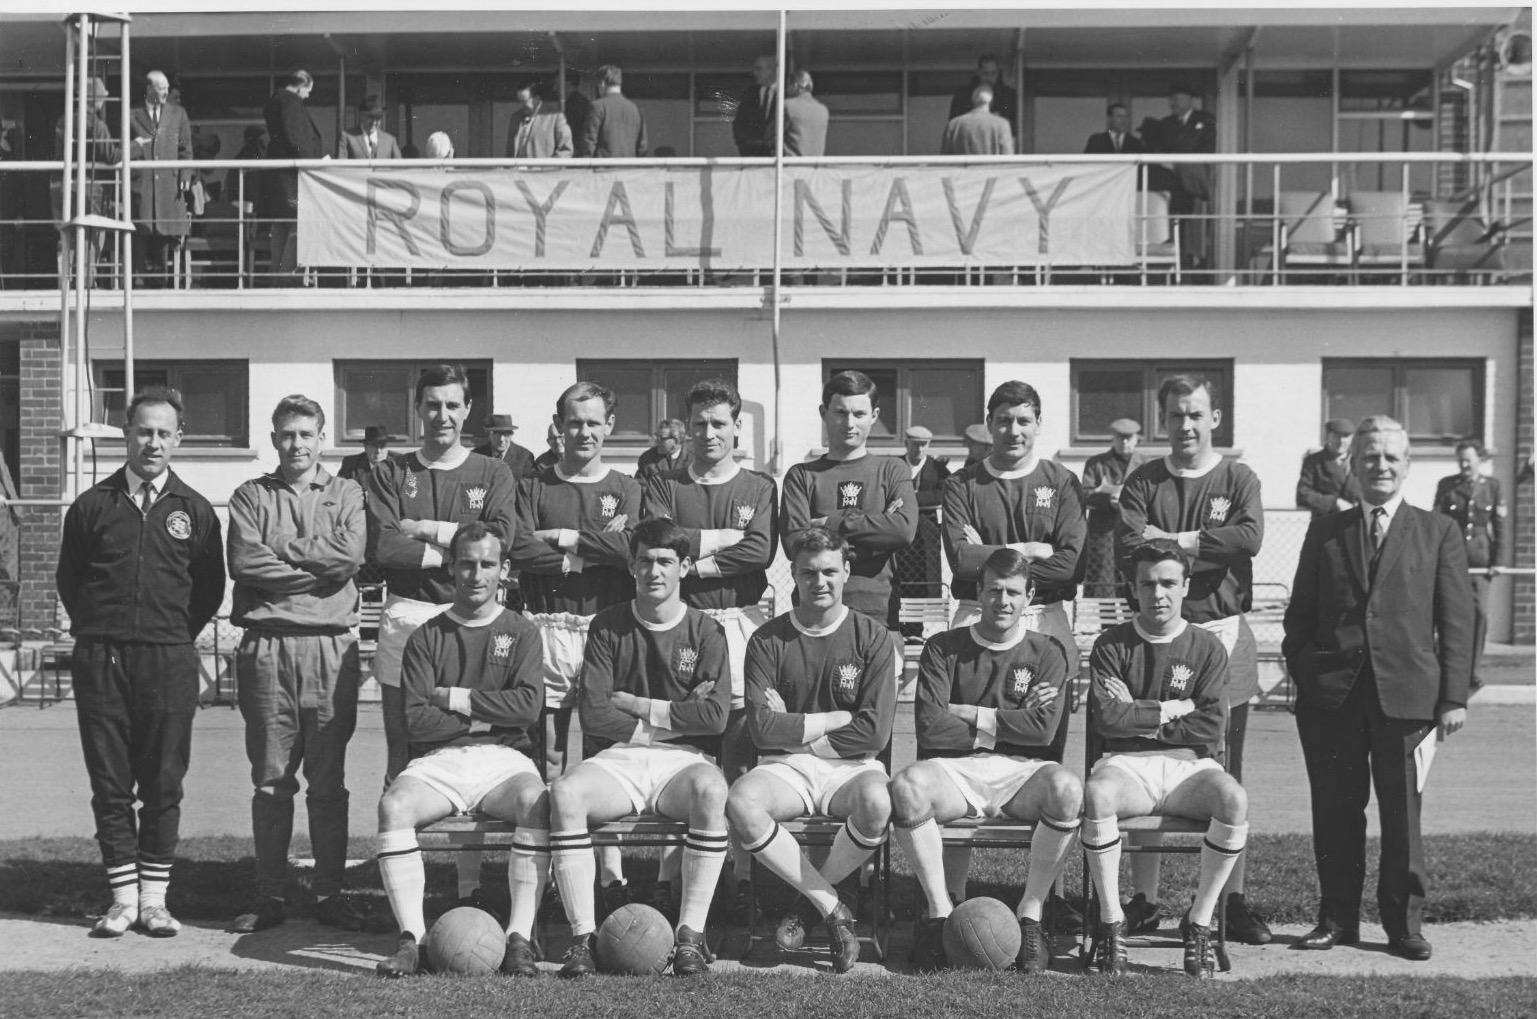 1968 Royal Navy Football Team